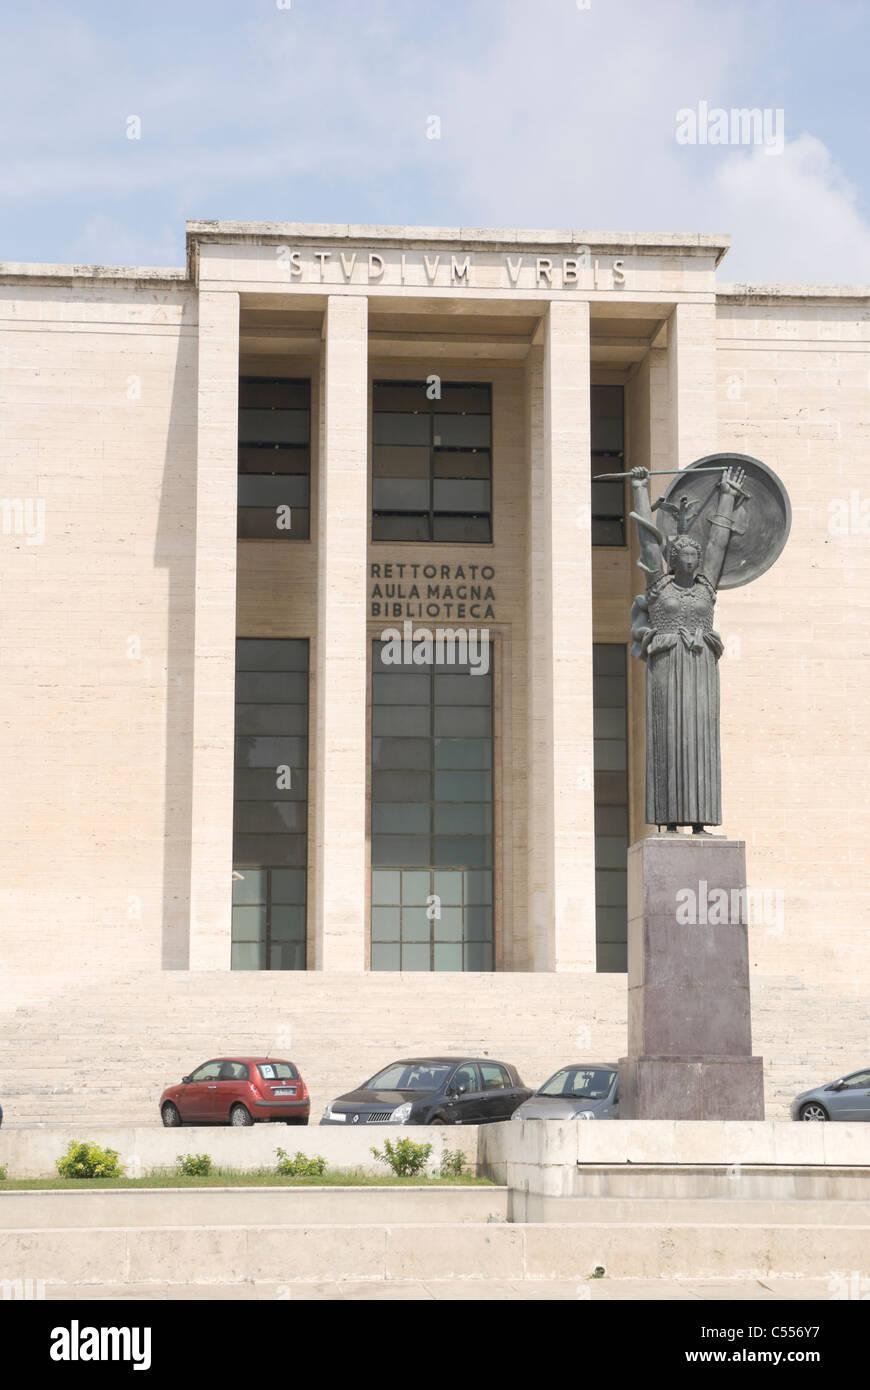 La Sapienza university building detail with Minerva goddess statue - Stock Photo